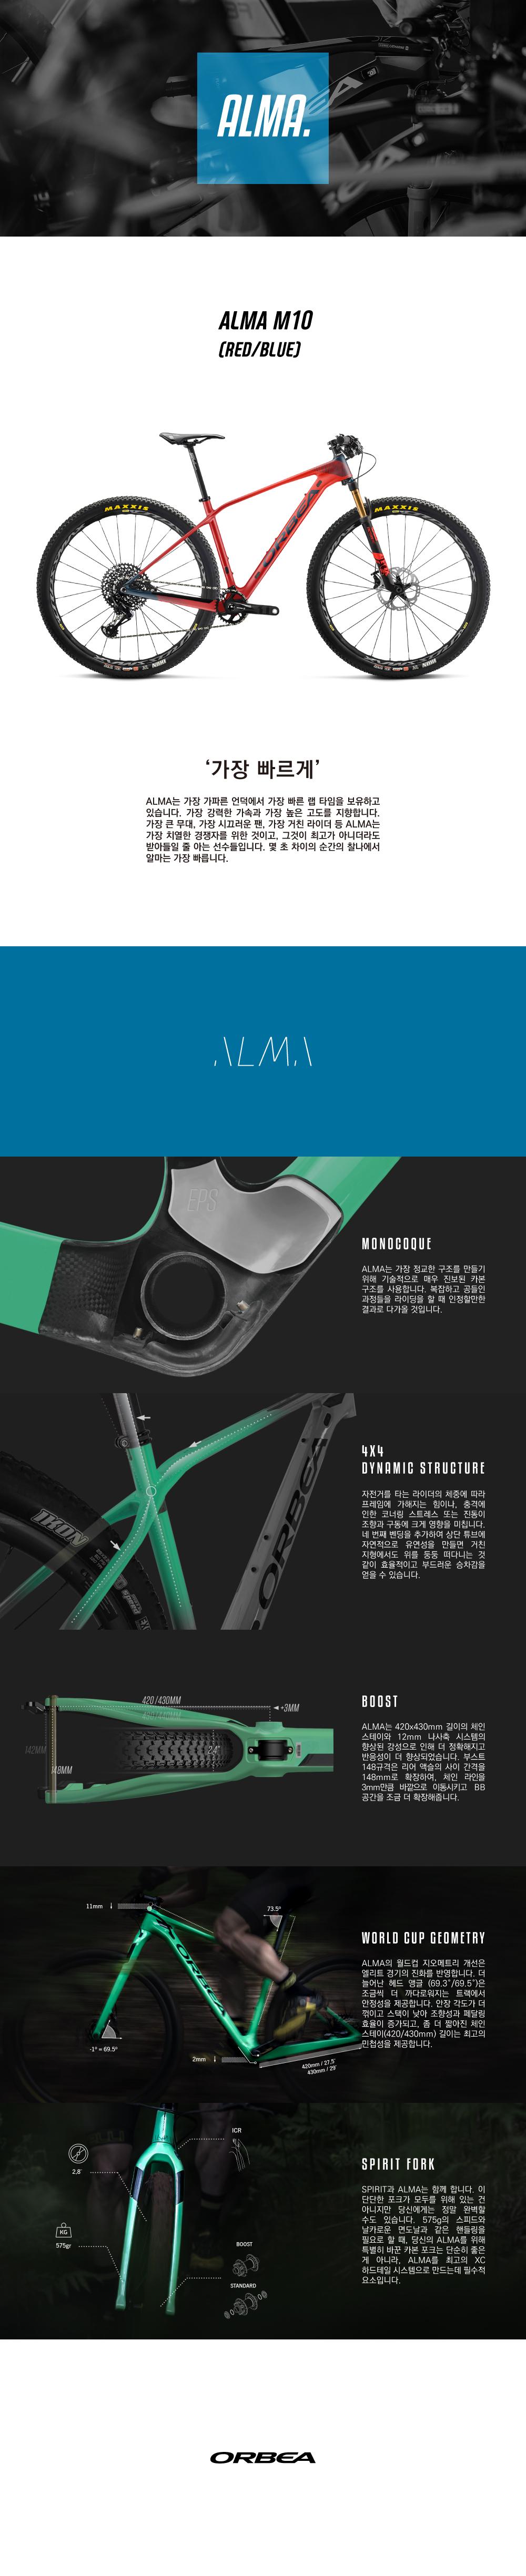 ALMA-M10-REDBLUE.jpg